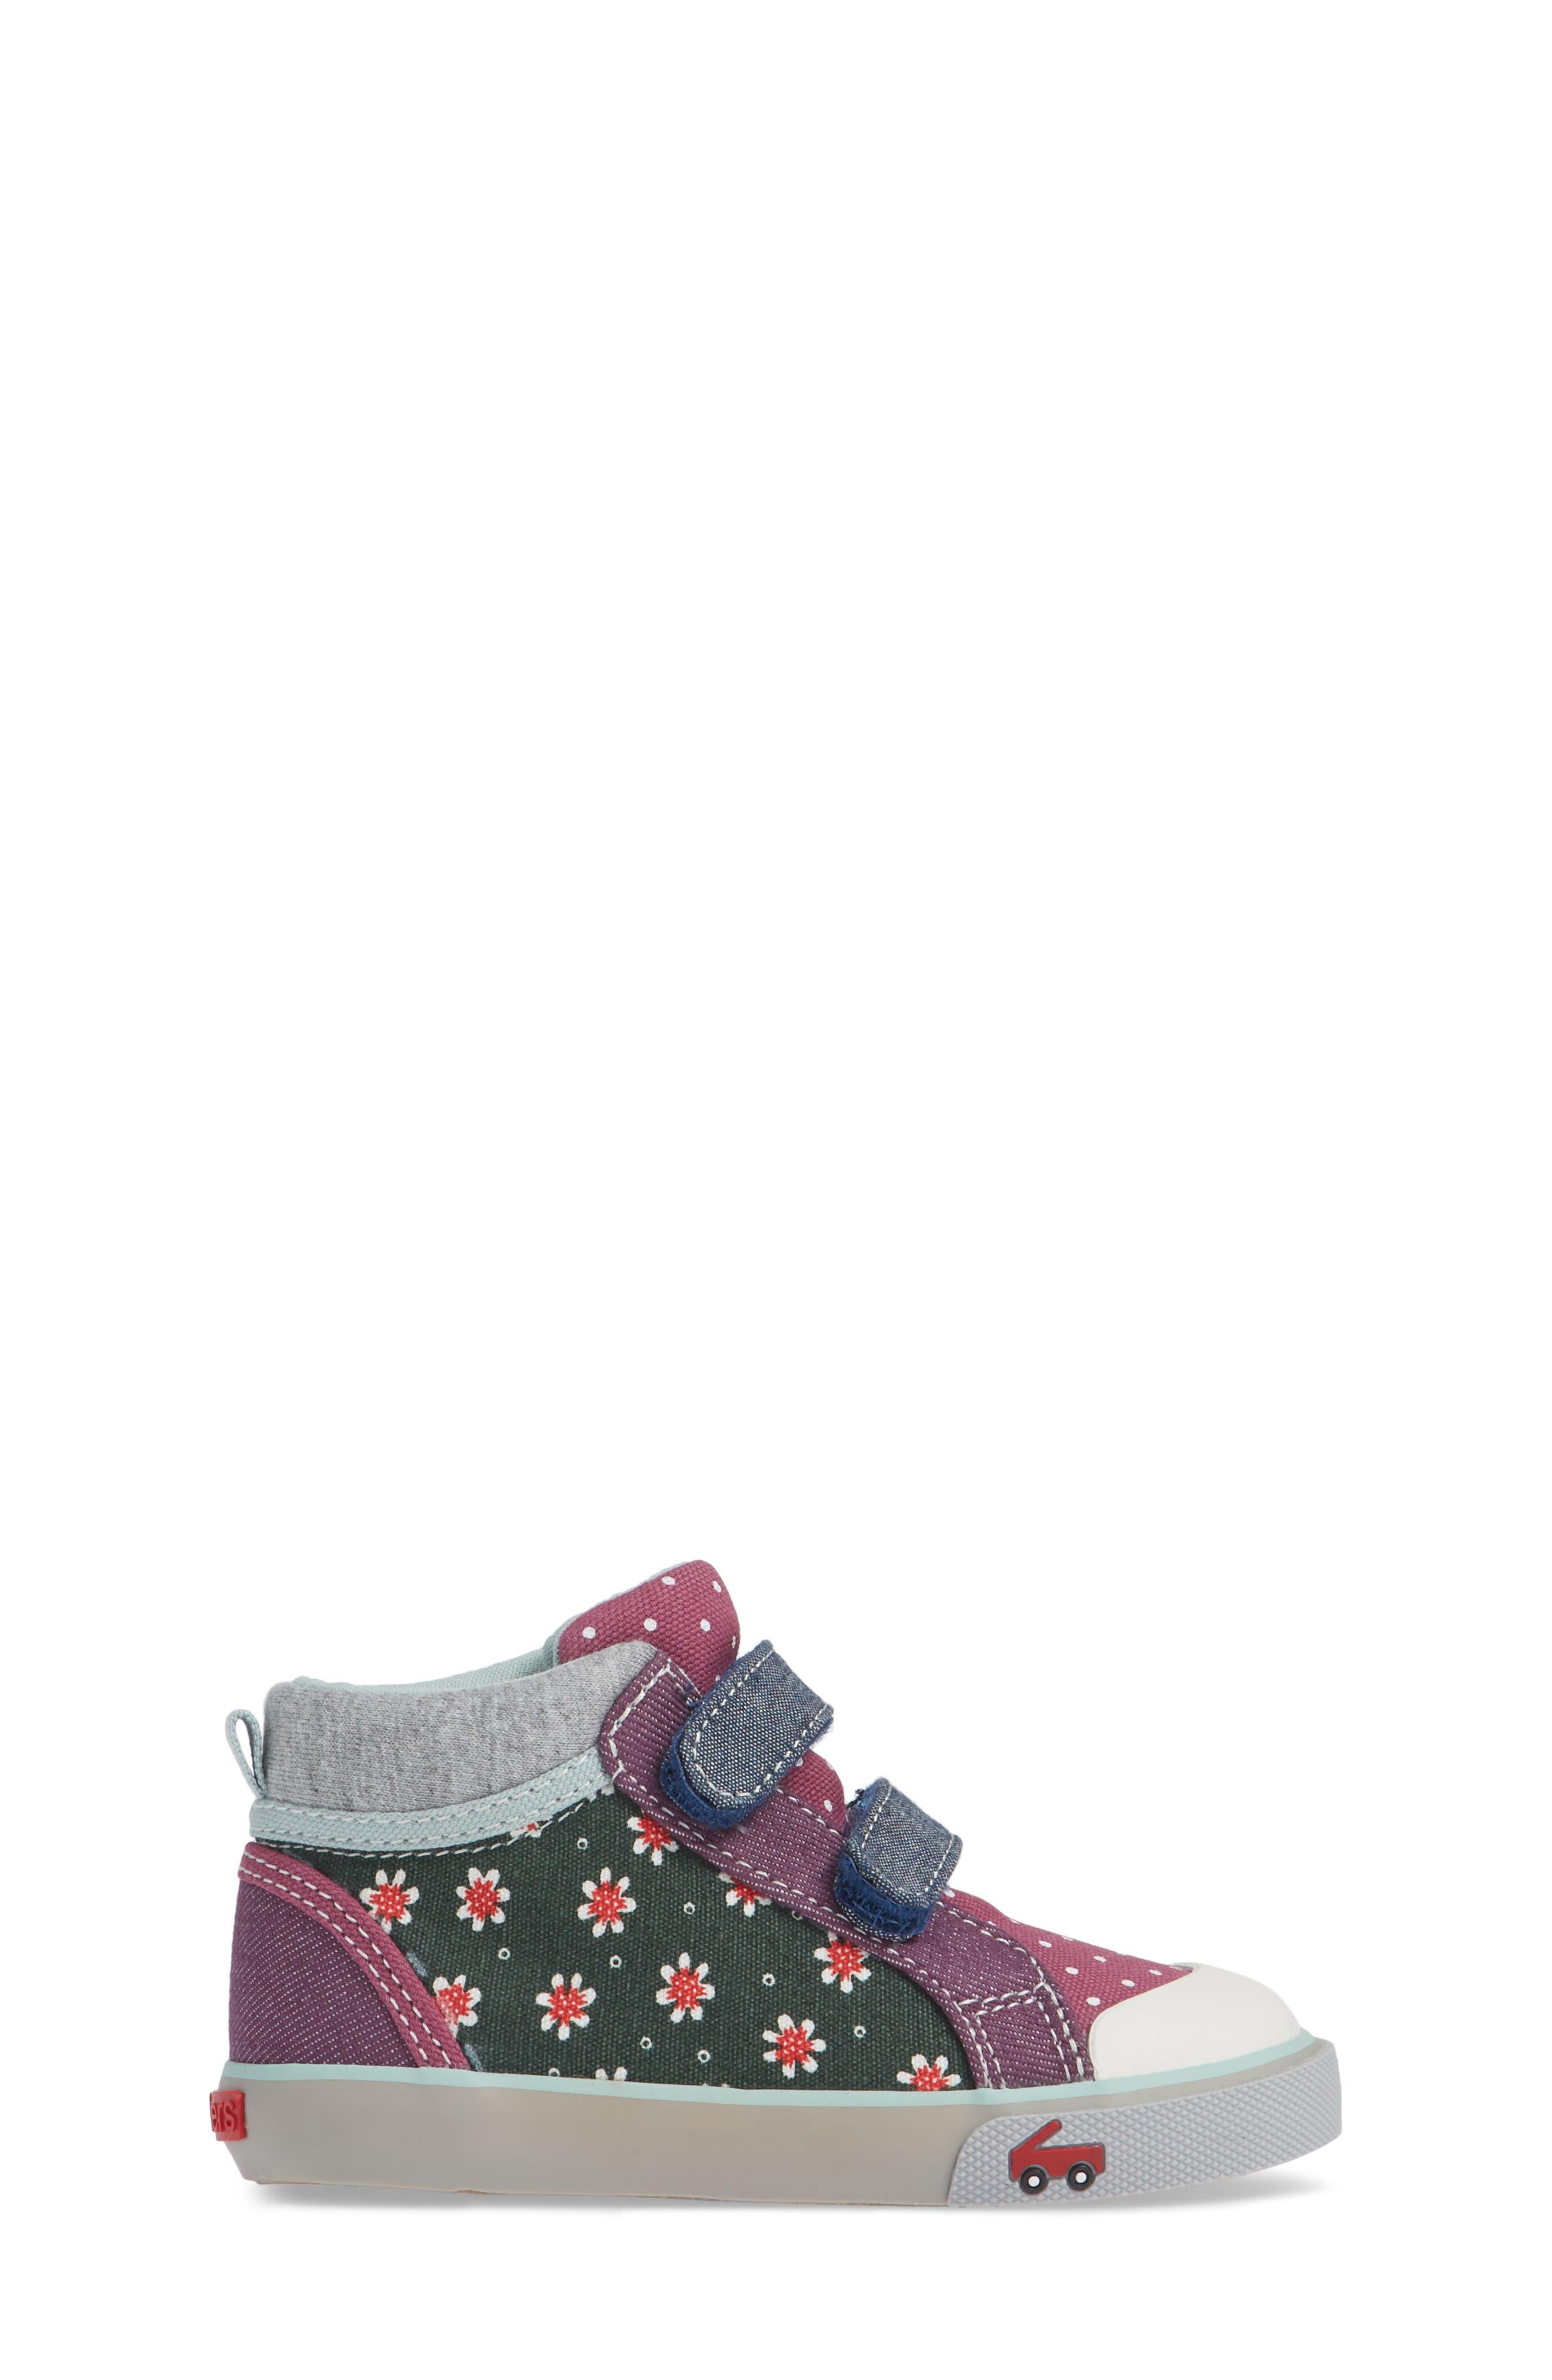 Kya Sneaker,                             Alternate thumbnail 3, color,                             GREEN FLORAL/MULTI